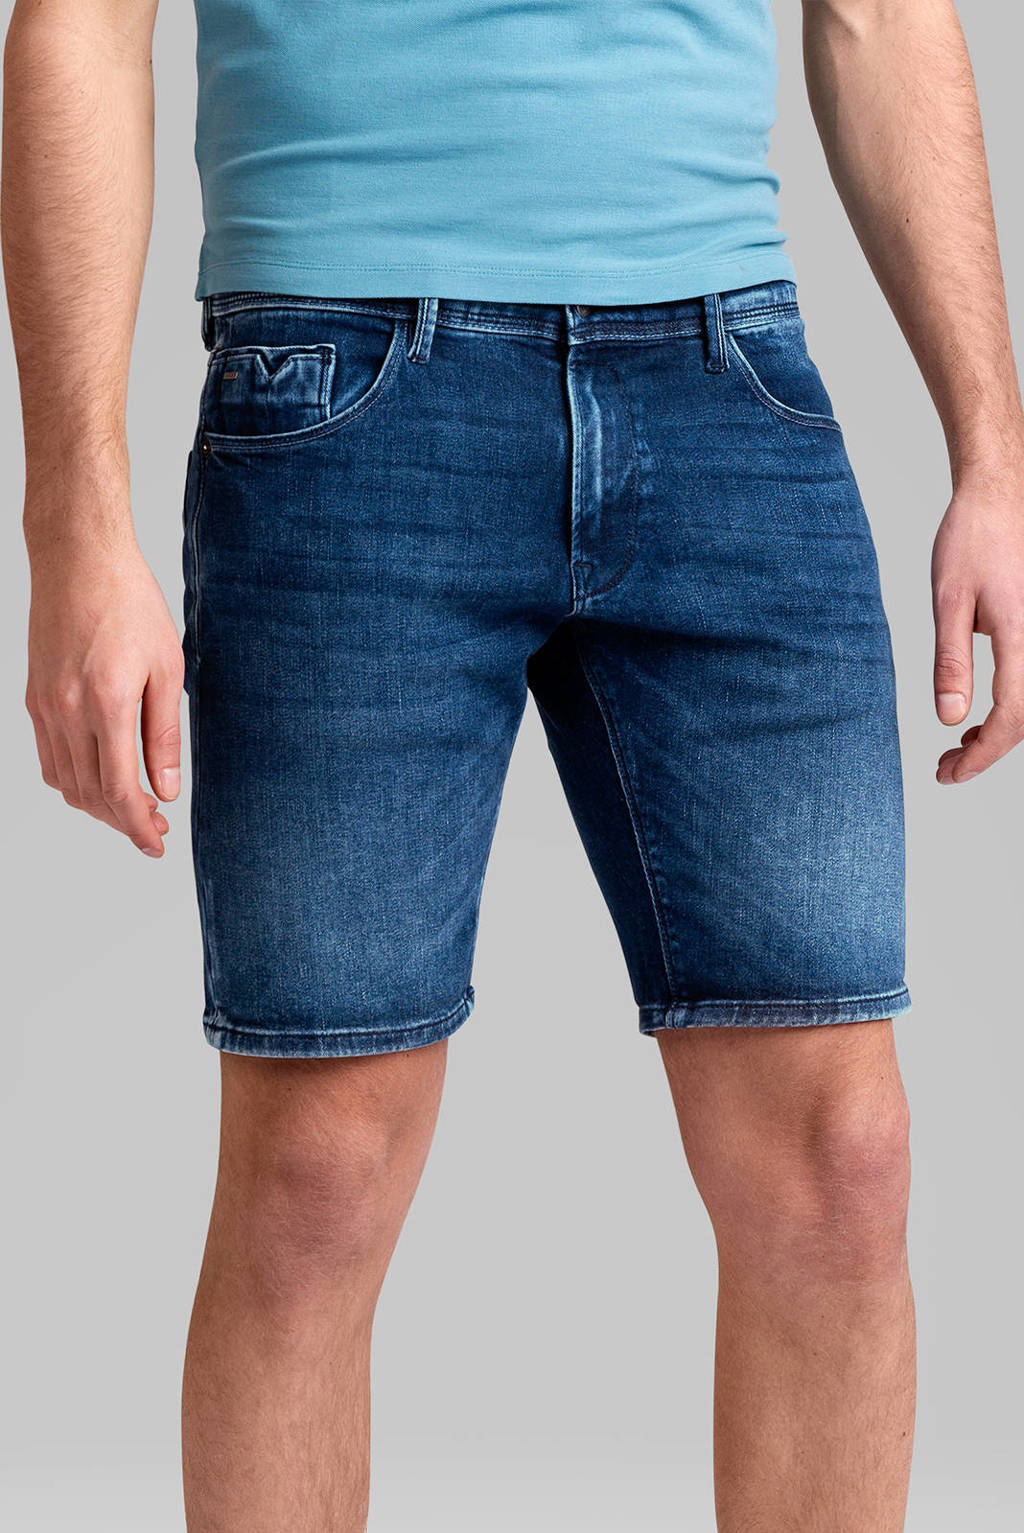 Vanguard slim fit jeans short V18 mwf, MWF